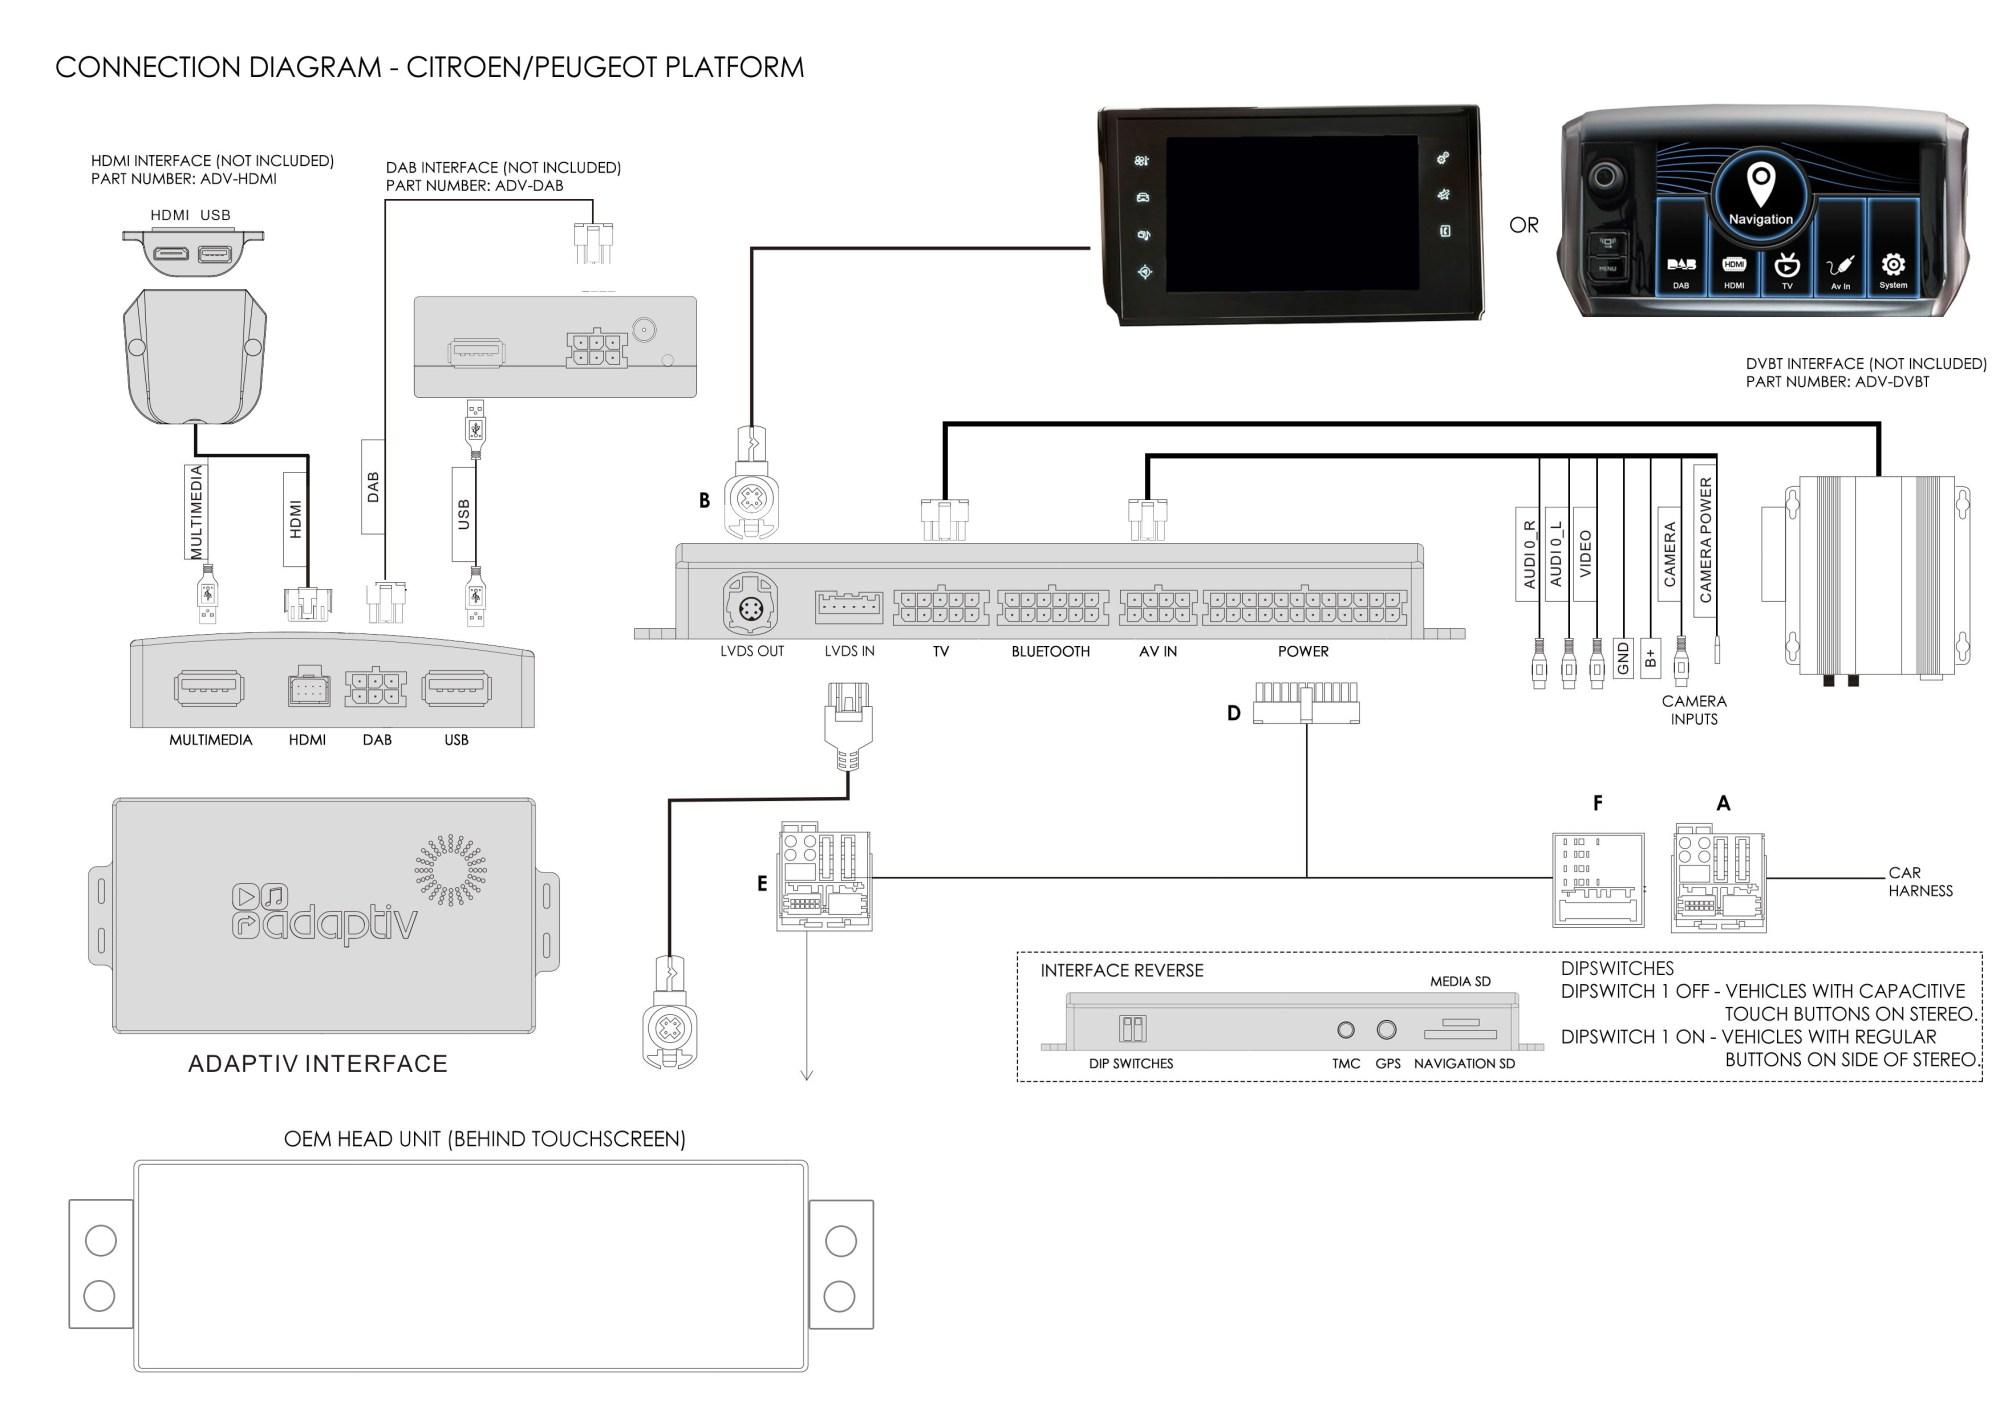 hight resolution of c5 saloon 2014 2018 navigation interface peugeot smeg peugeot 605 wiring diagram peugeot 505 gti